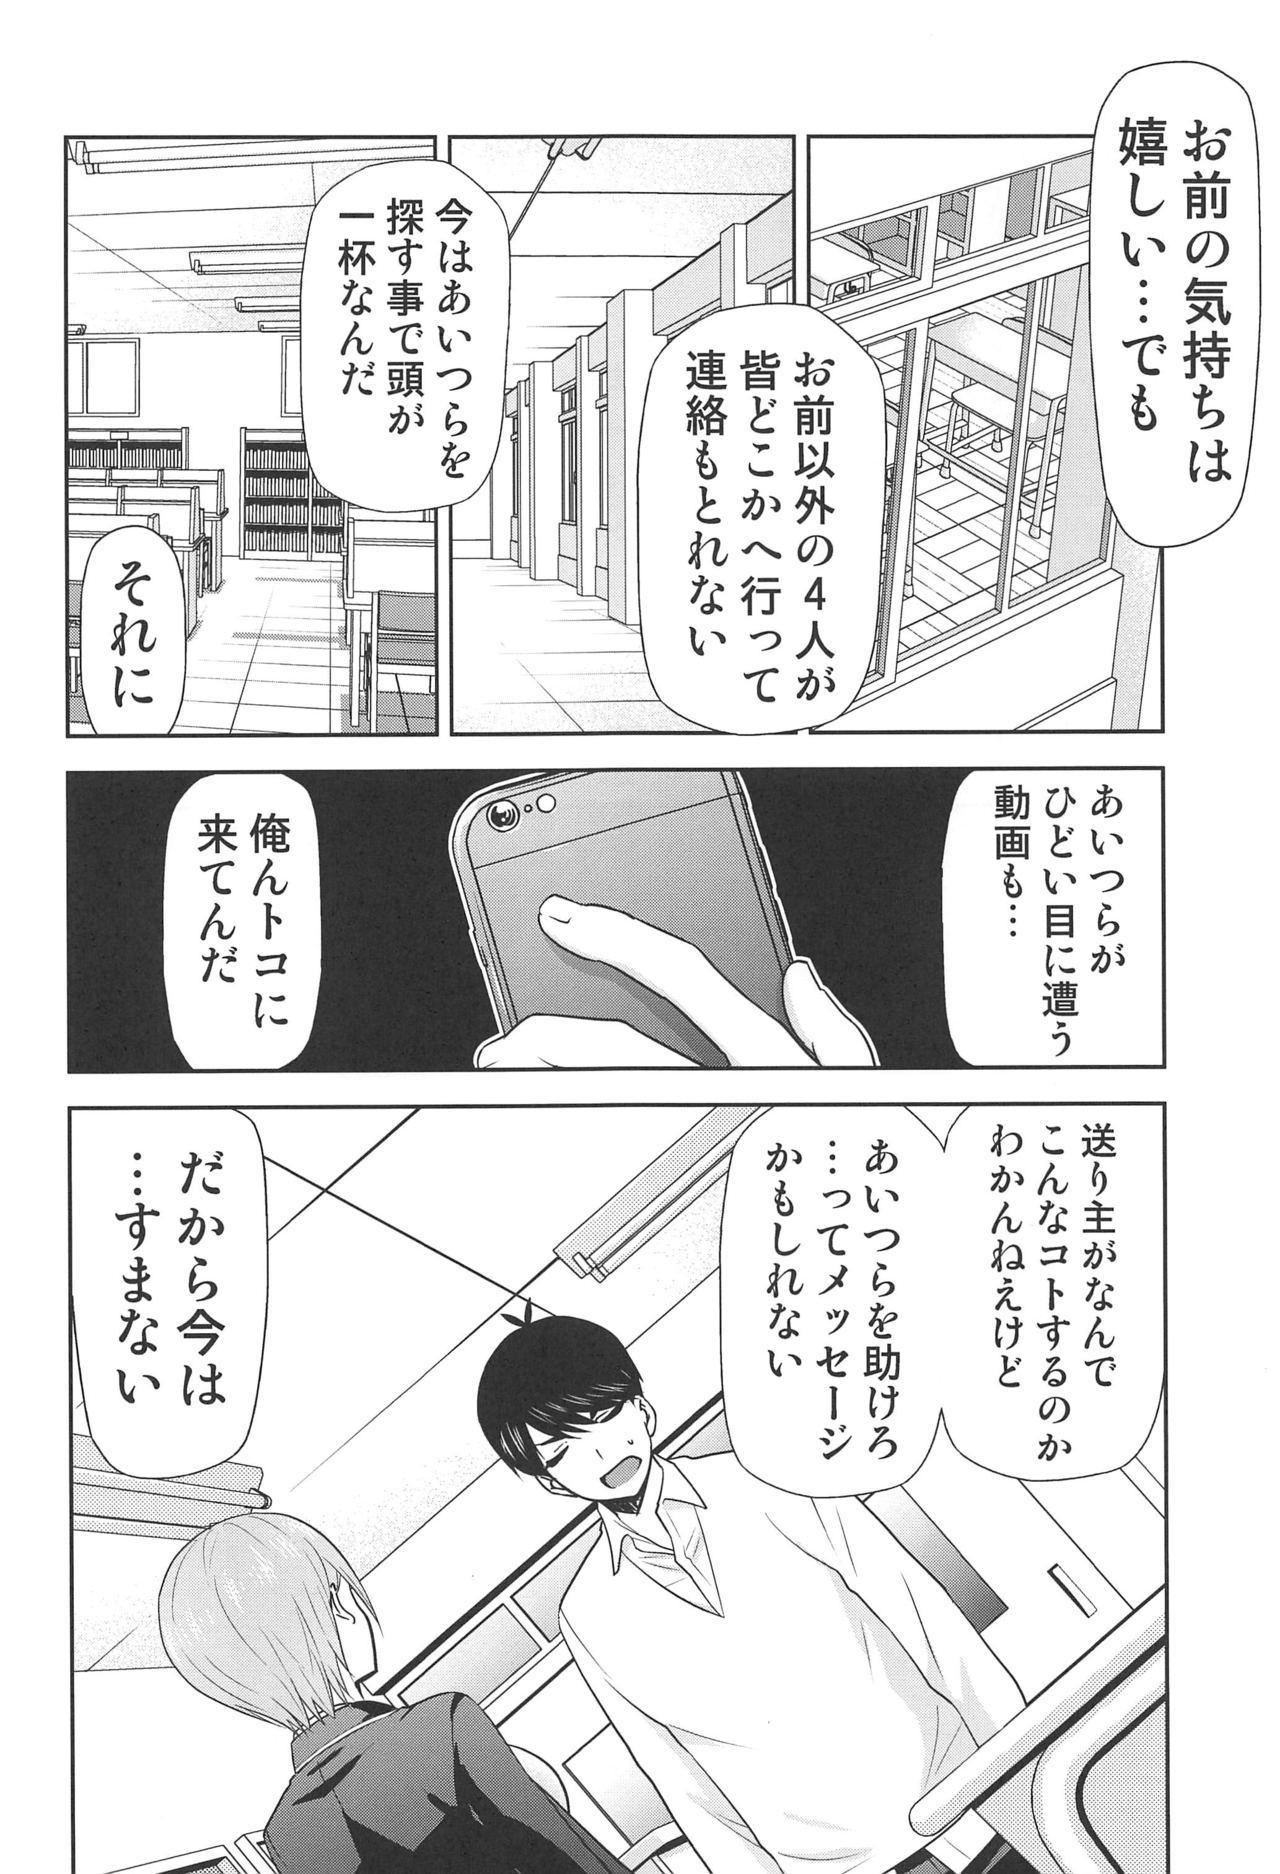 Gotoubun no Seidorei ∬ 50